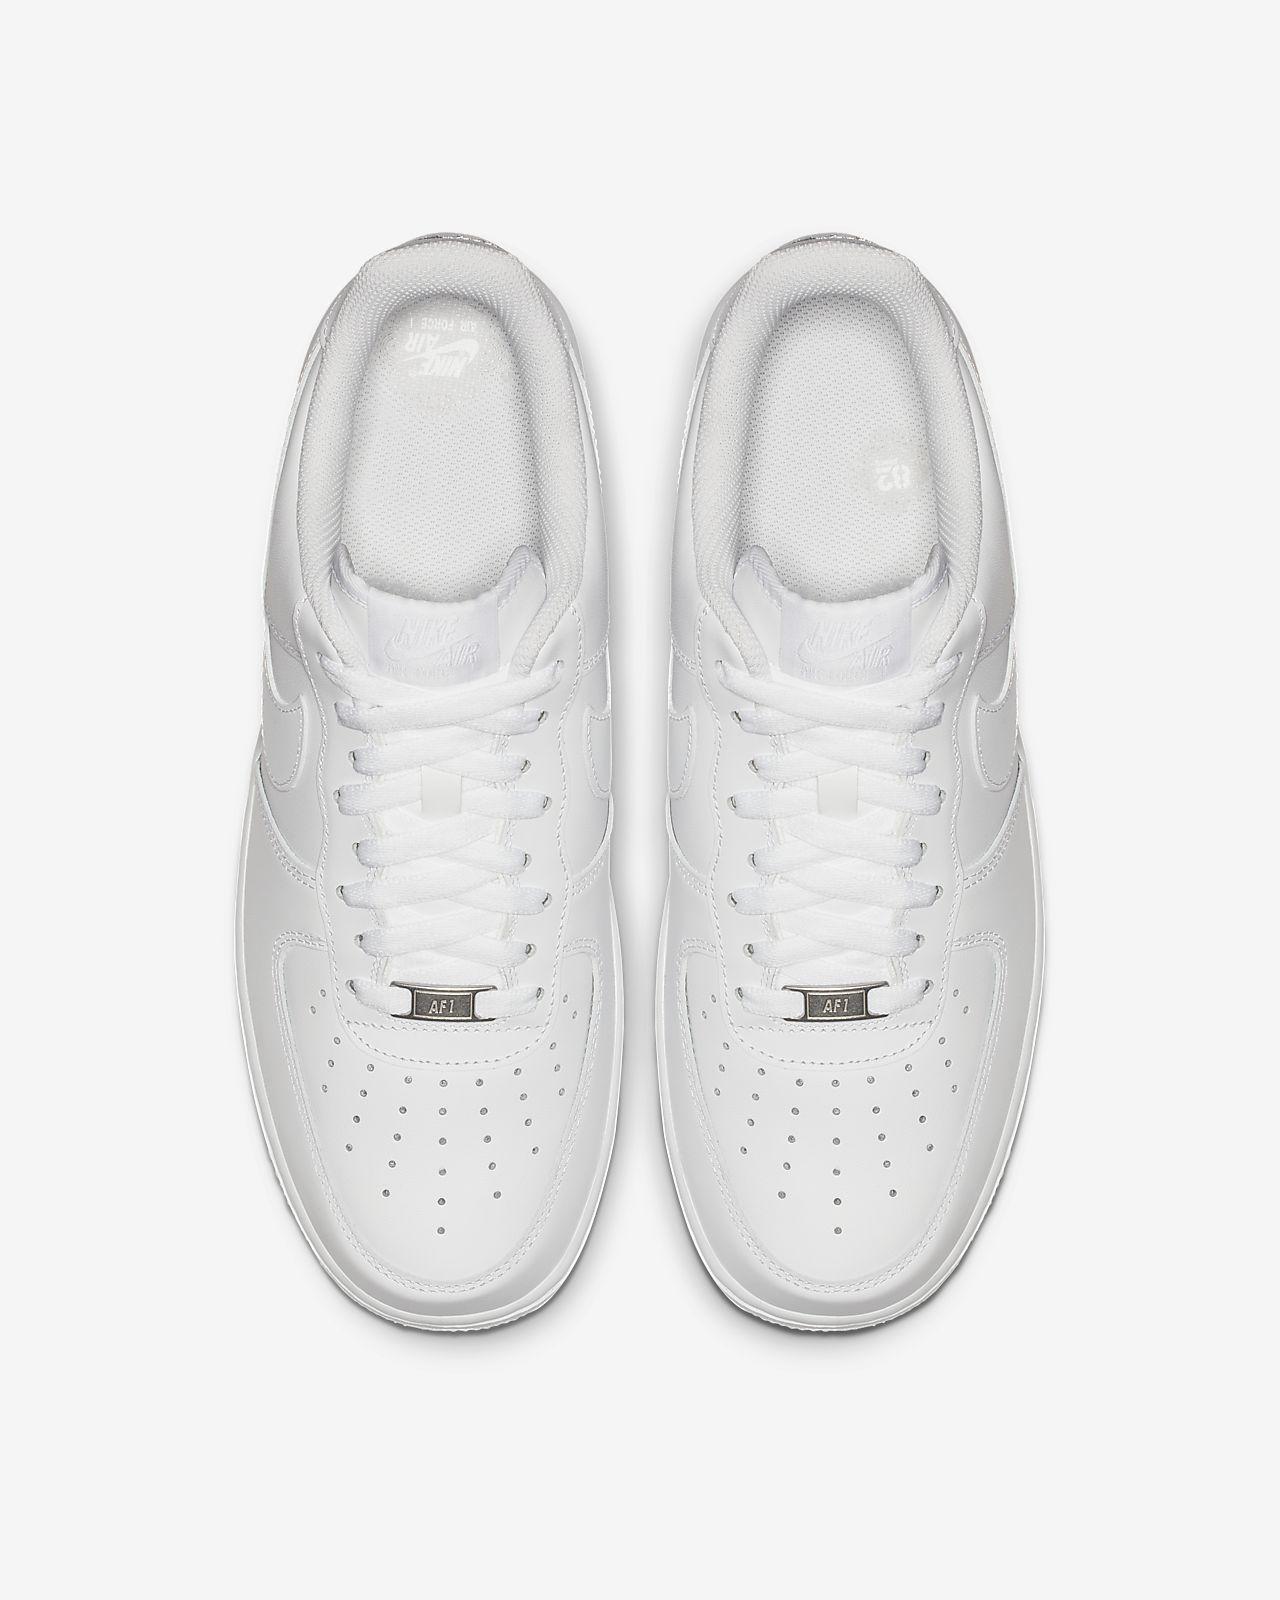 ae8624f5 Мужские кроссовки Nike Air Force 1 '07. Nike.com RU